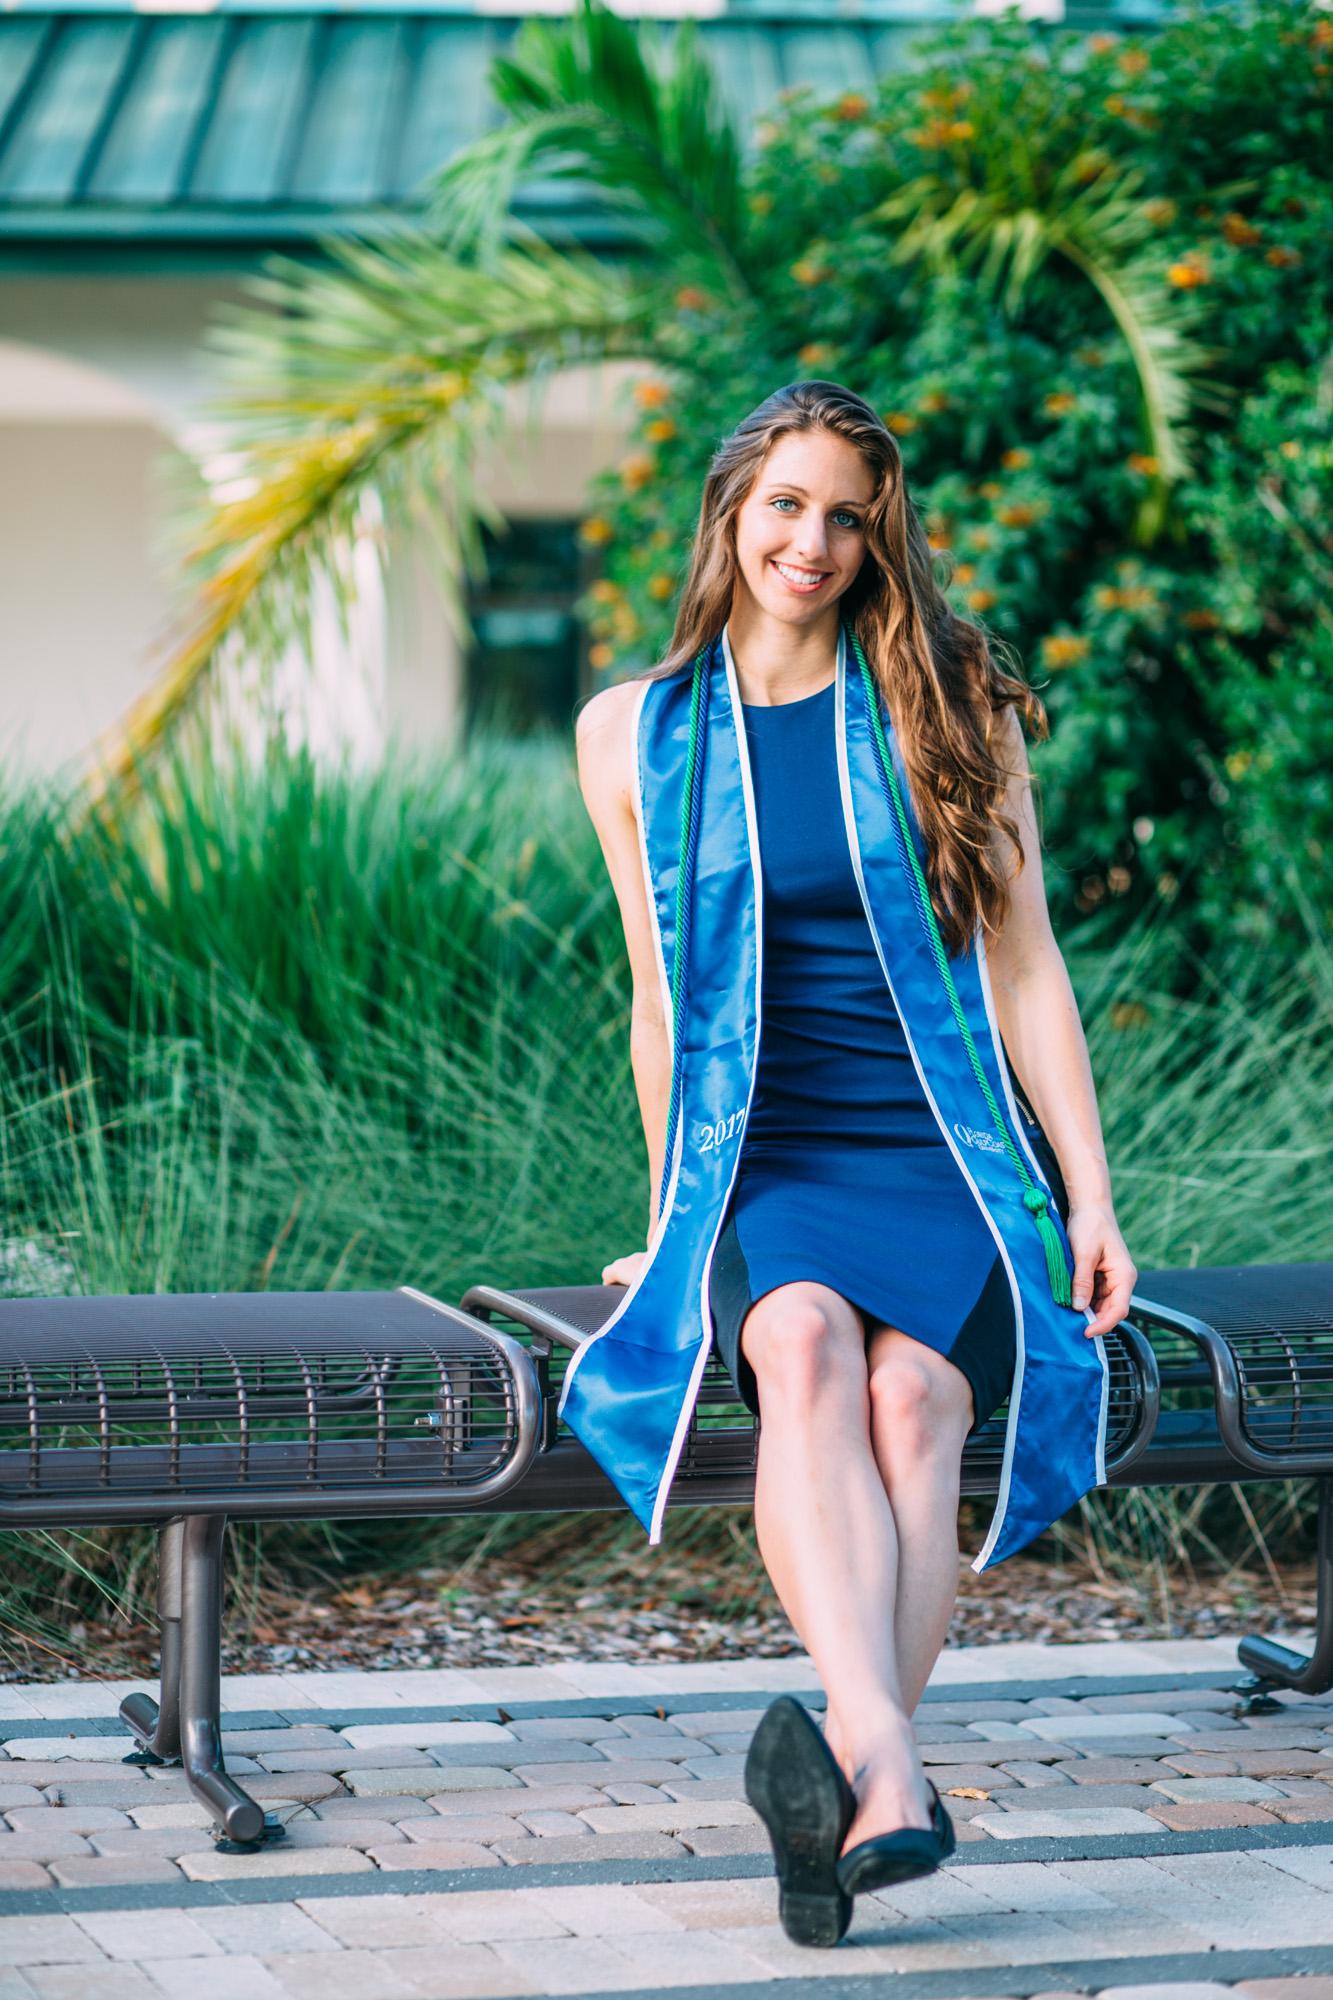 Lauren Goulet FGCU blog post (10 of 11).jpg